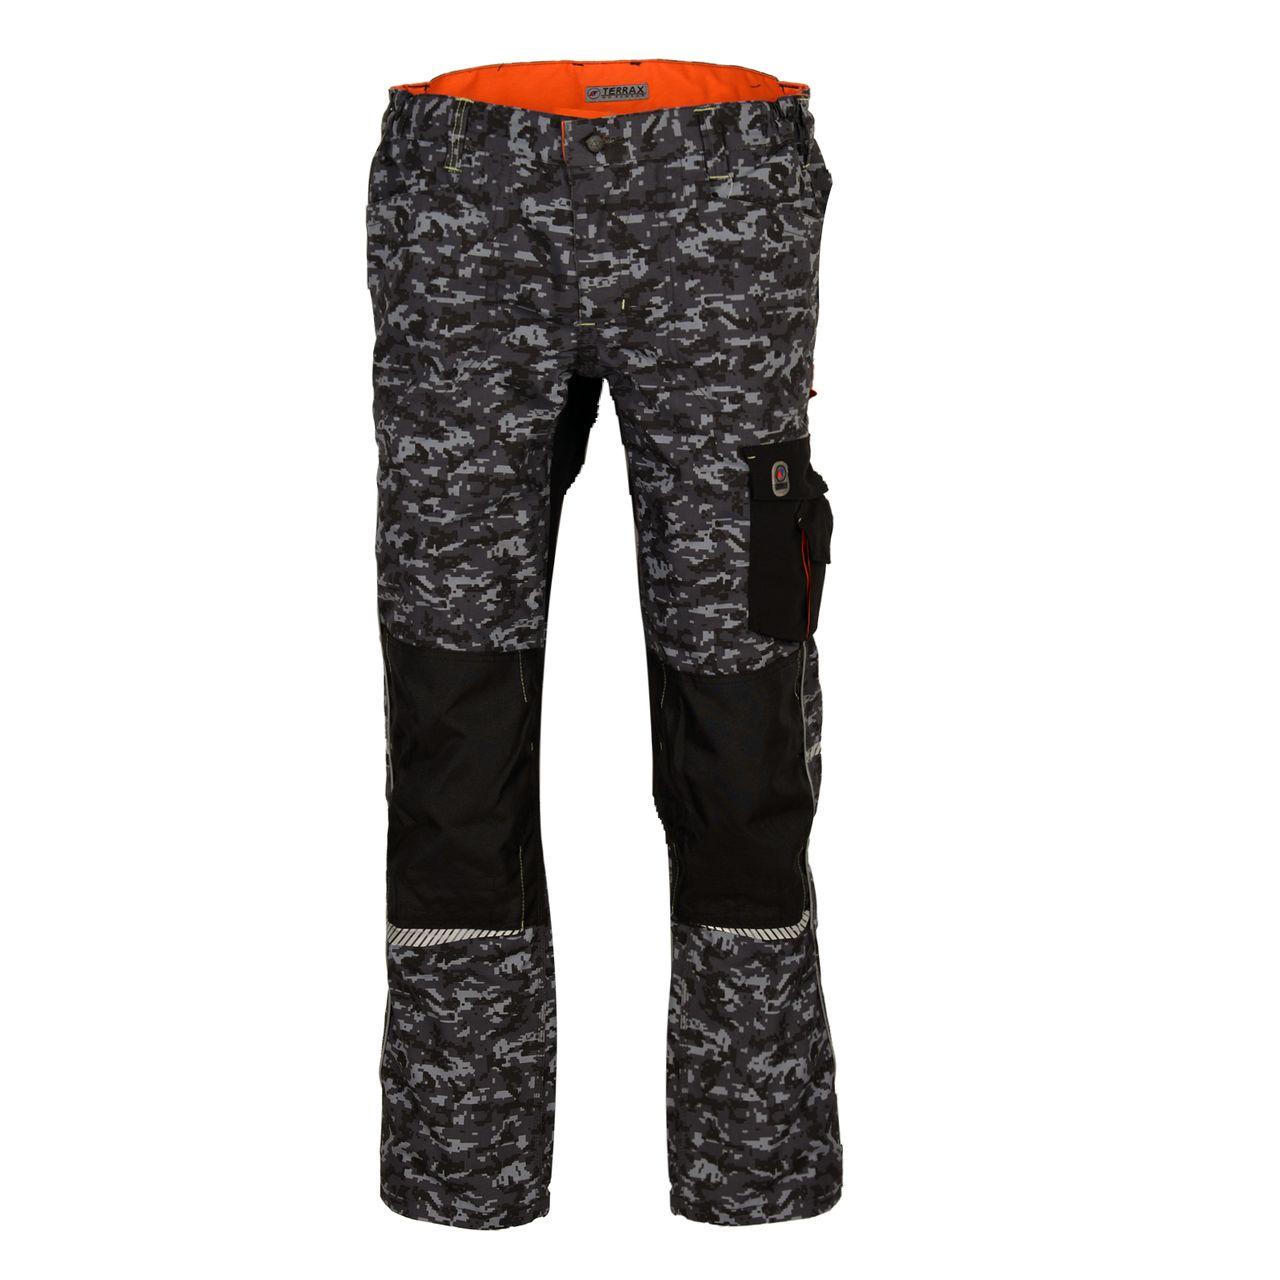 TERRAX WORKWEAR Herren Bundhose, Camouflage/Grau